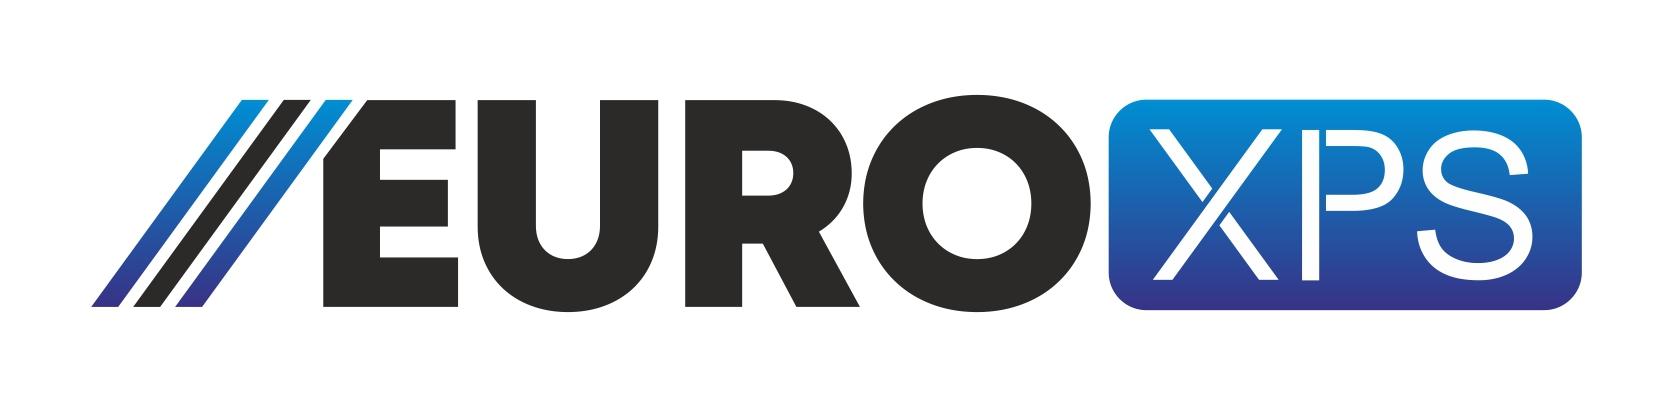 Bildmarke: EURO XPS